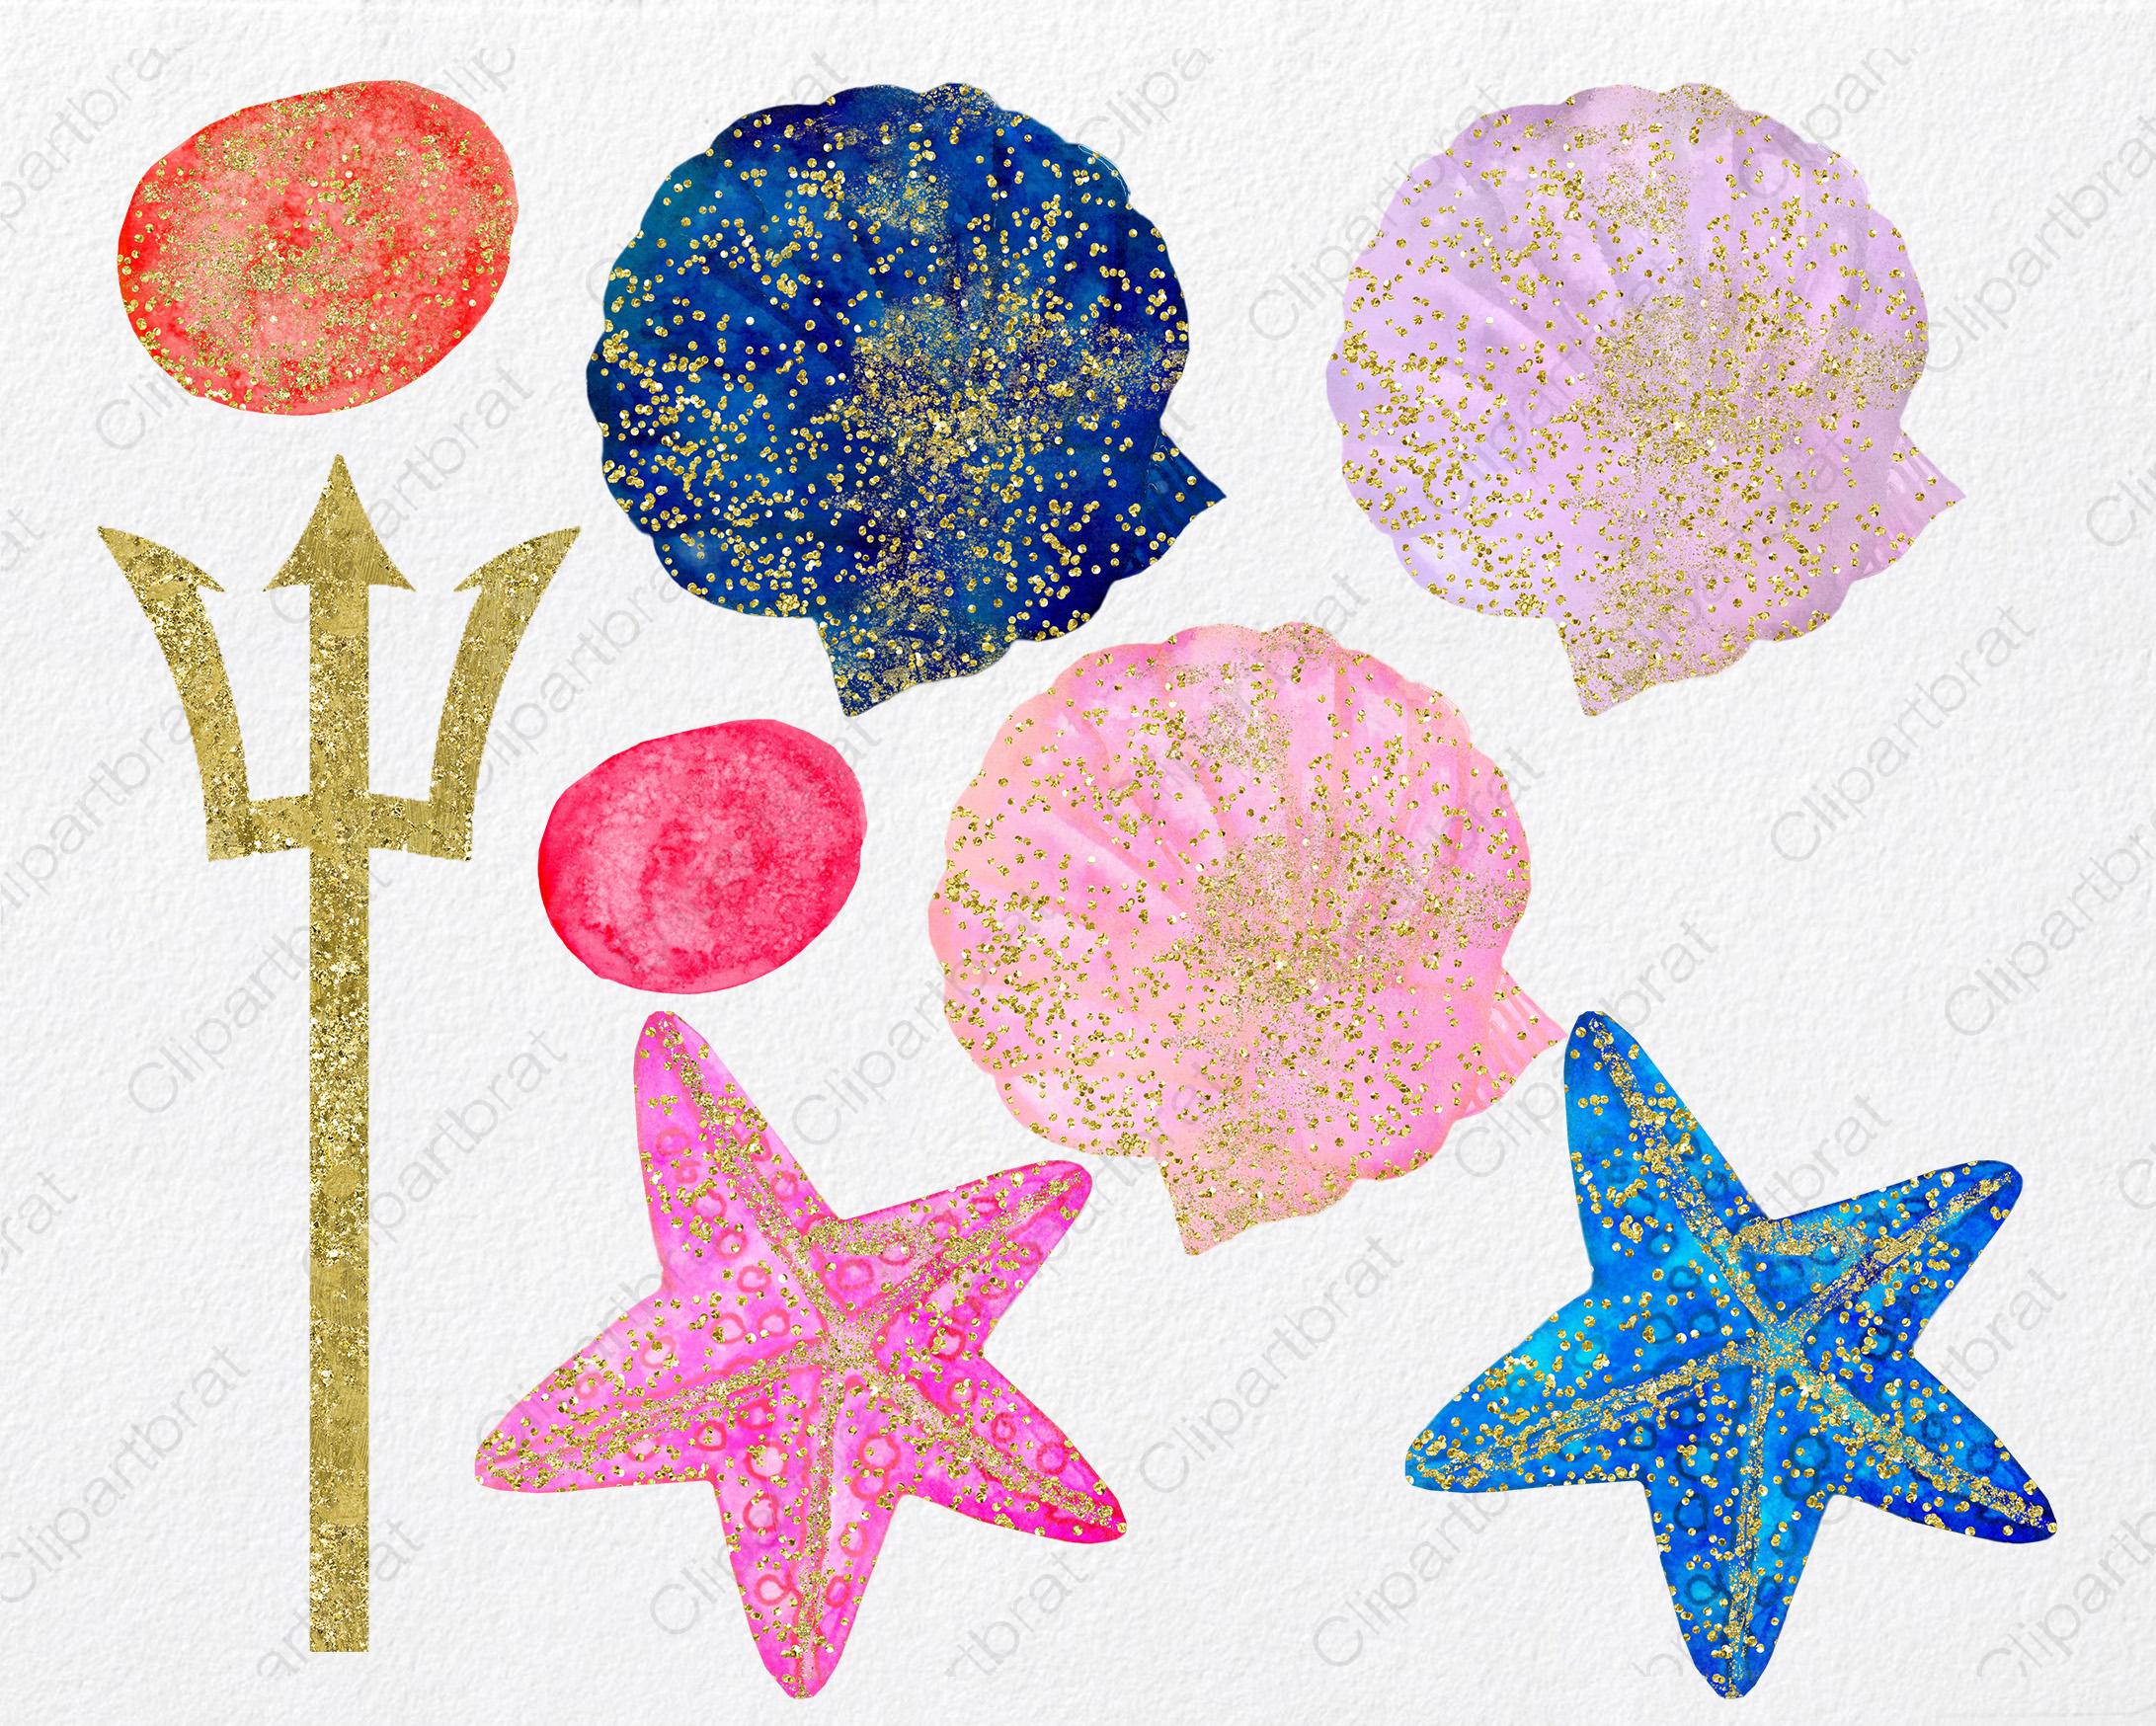 WATERCOLOR MERMAID Clipart  with Metallic Gold Confetti Mermaids Shells Starfish Ocean Watercolour Splash Graphics example image 4